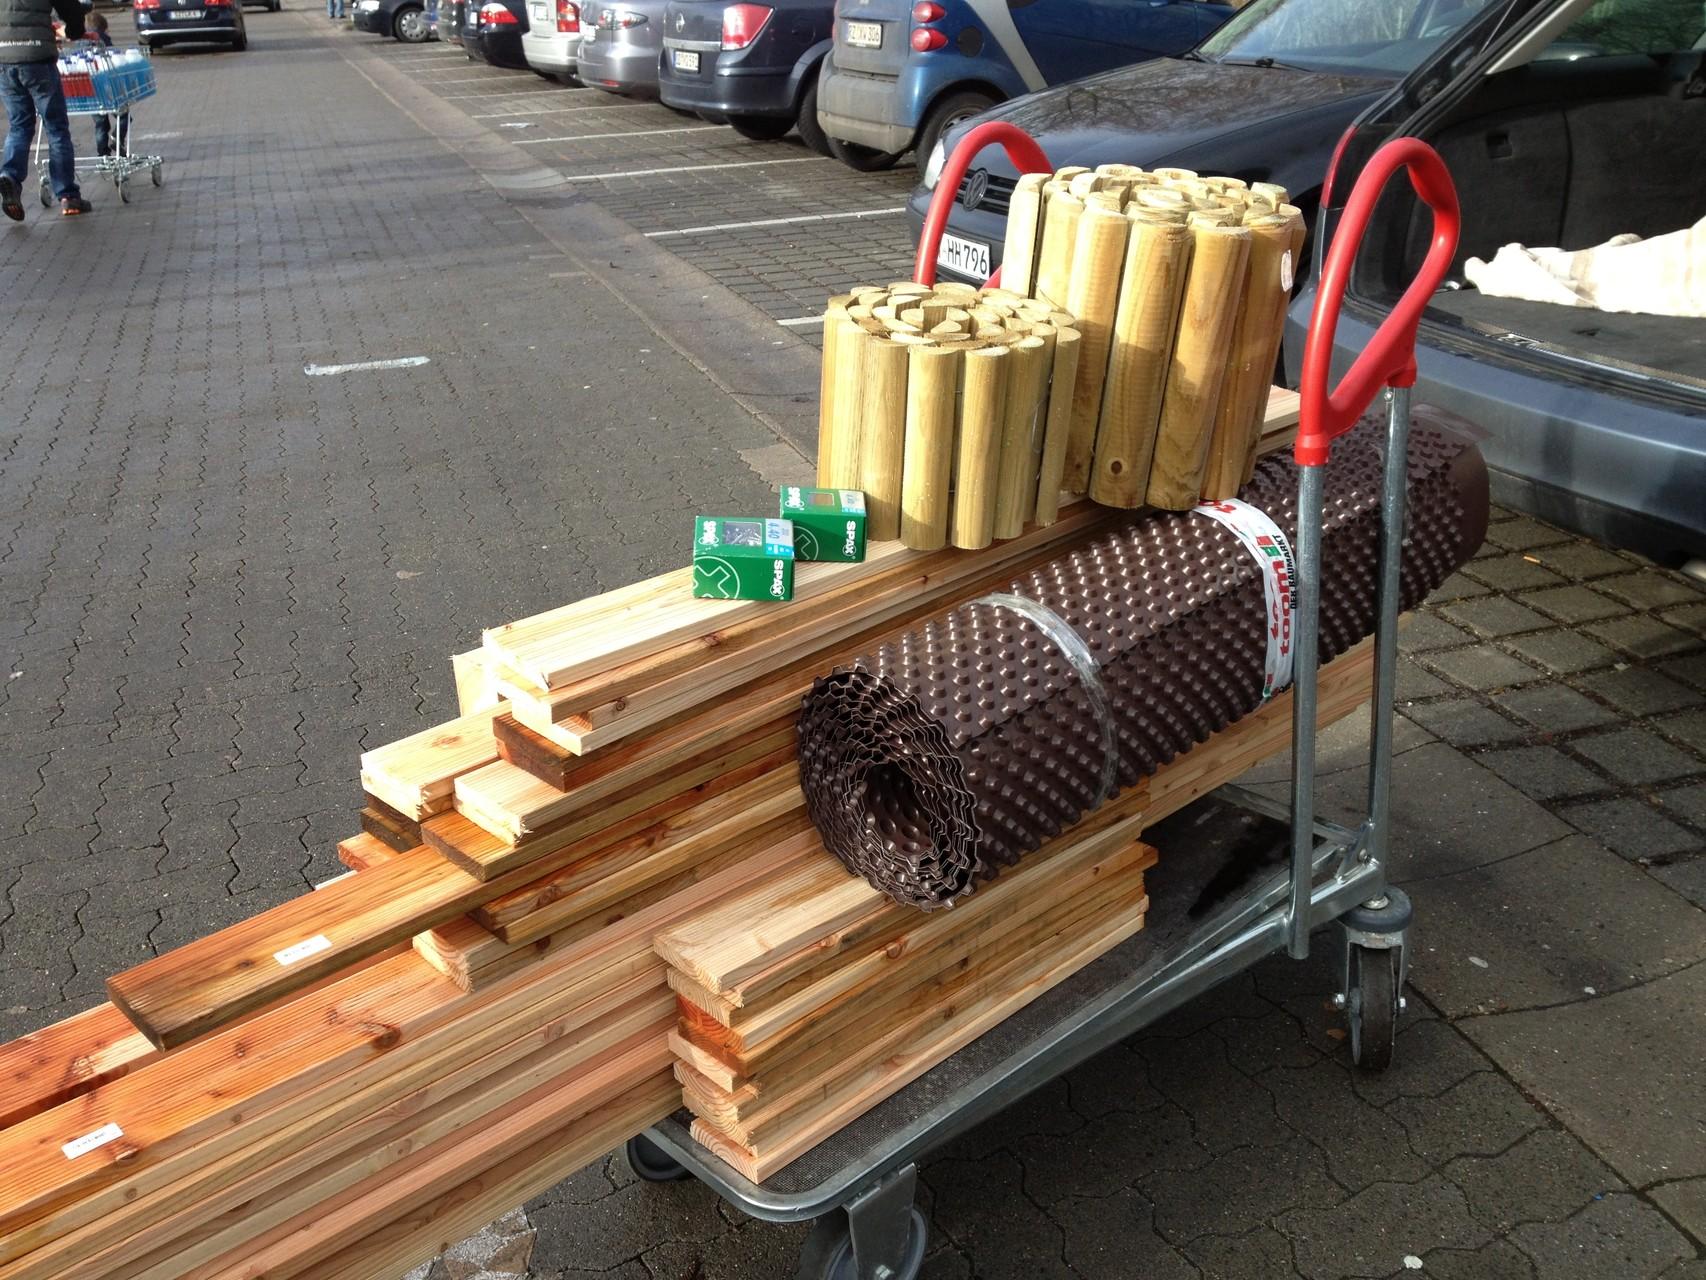 Küchengarten-Box: Baumaterial aus dem Baumarkt